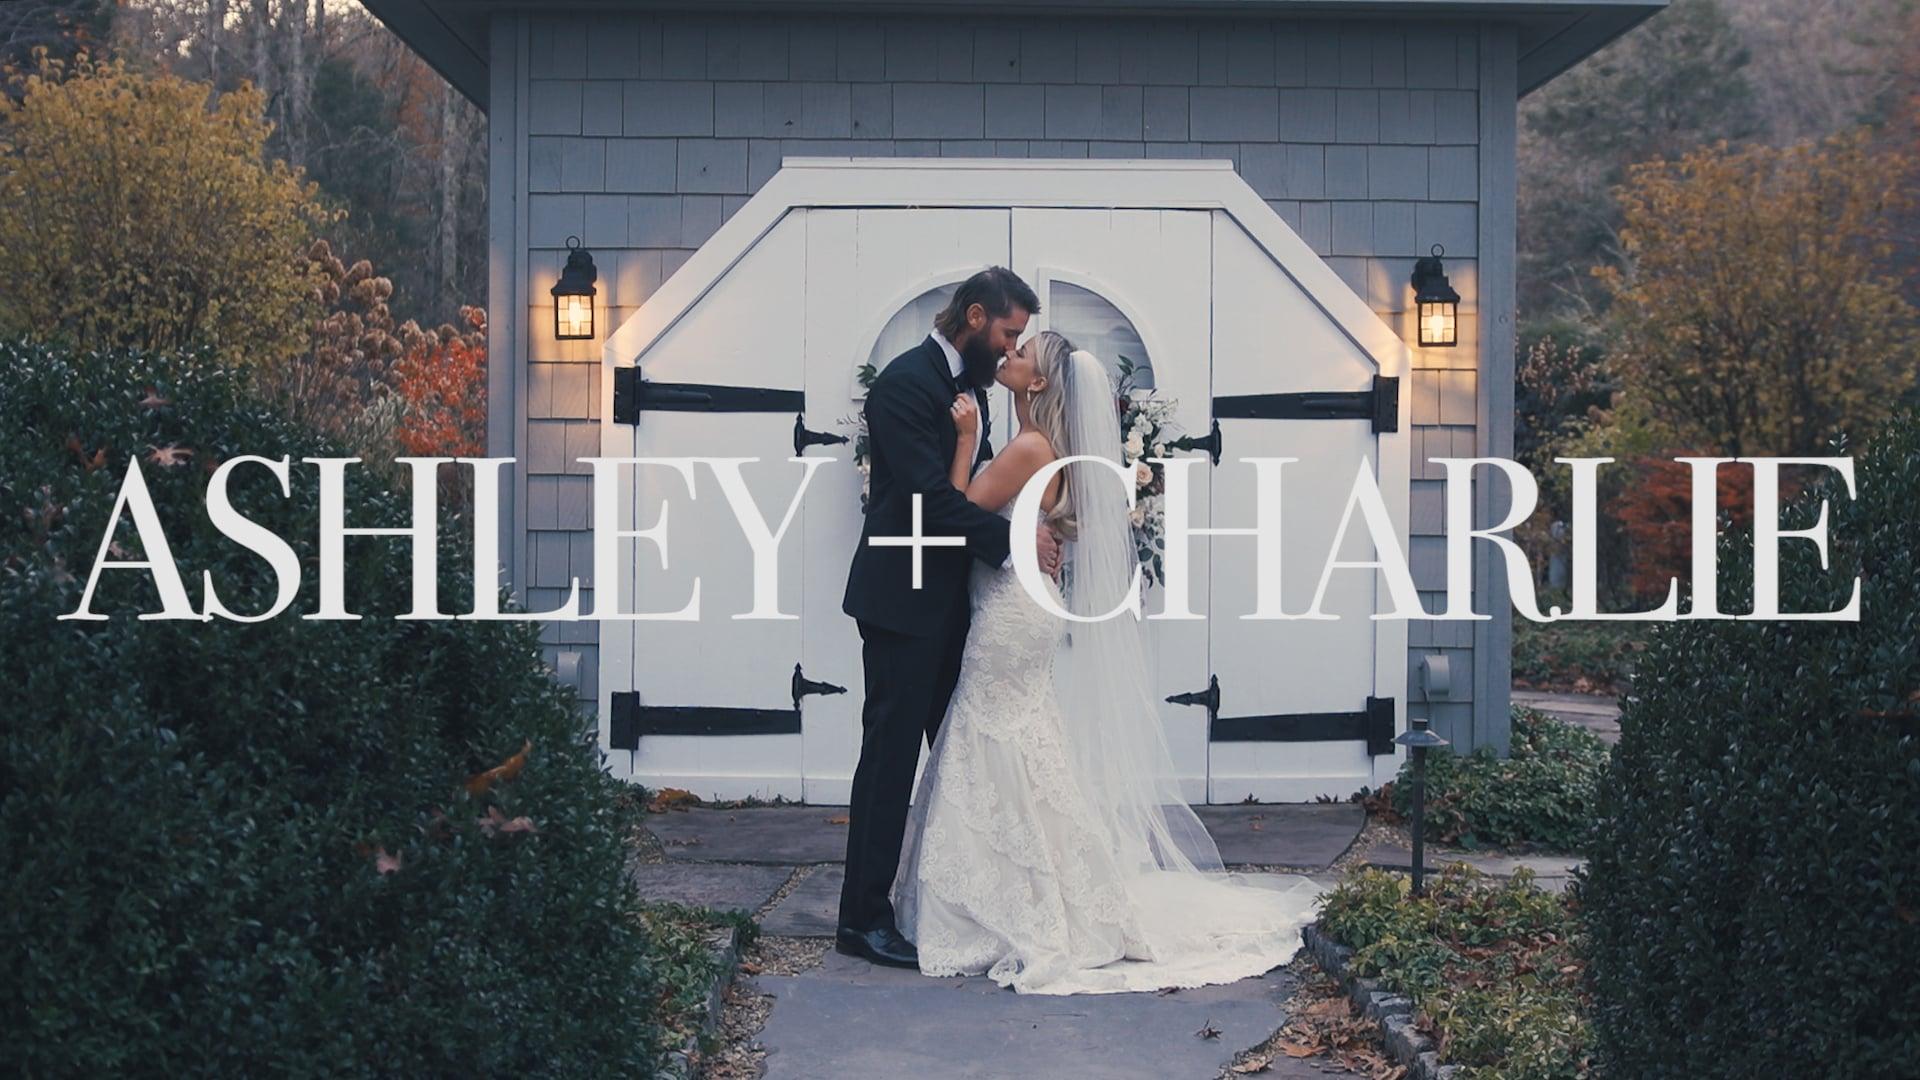 Ashley x Charlie // HIGHLIGHT VIDEO